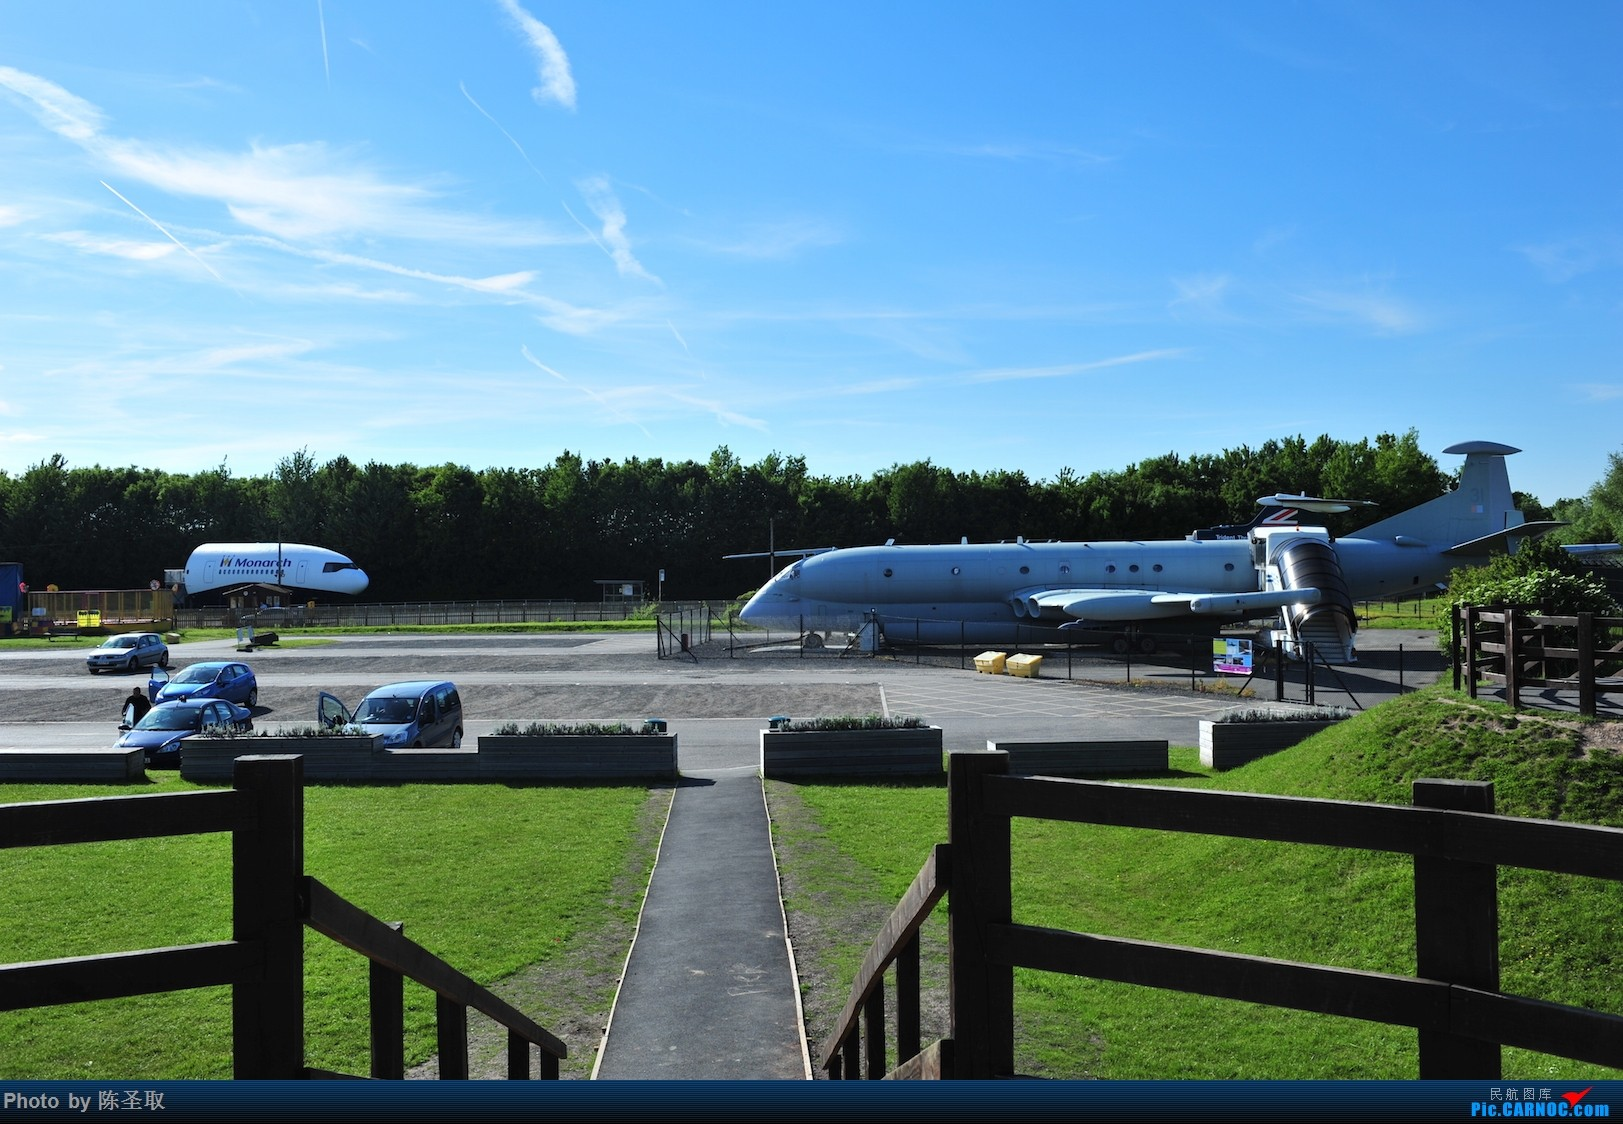 Re:[原创]迟来的6月曼城拍机图。廉价航空的天堂,曼彻斯特机场~ ATR-72 201 EI-REH 英国曼彻斯特机场 英国曼彻斯特机场